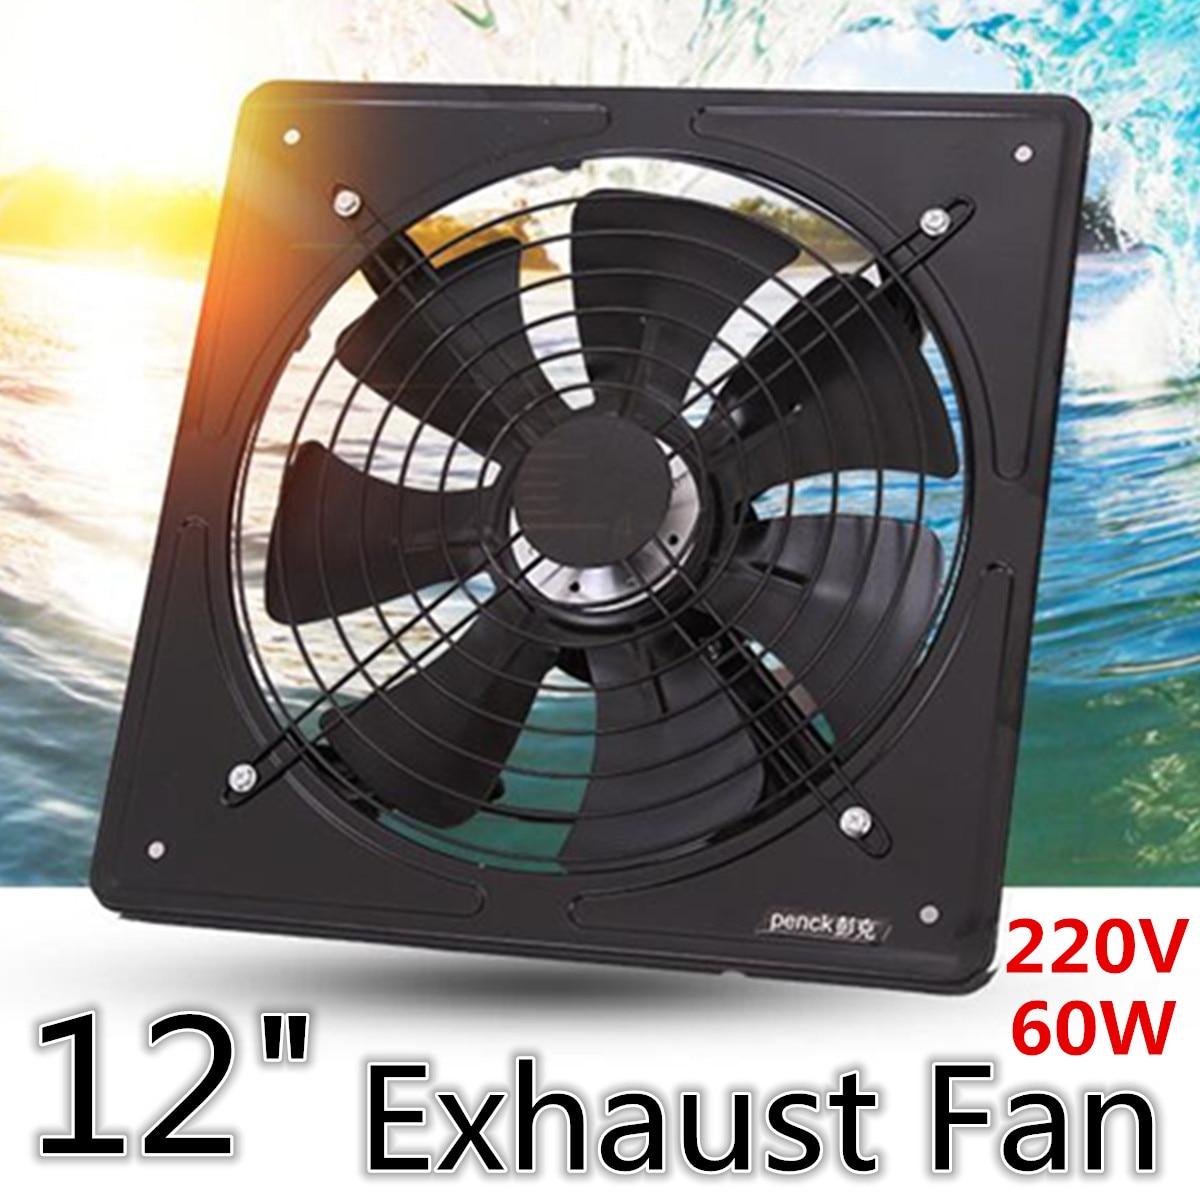 Здесь можно купить  12 inch Metal Exhaust Fan High Speed Air Extractor Window Ventilation Fan for Kitchen Ventilator Axial Industrial Wall Fan 220V  Бытовая техника